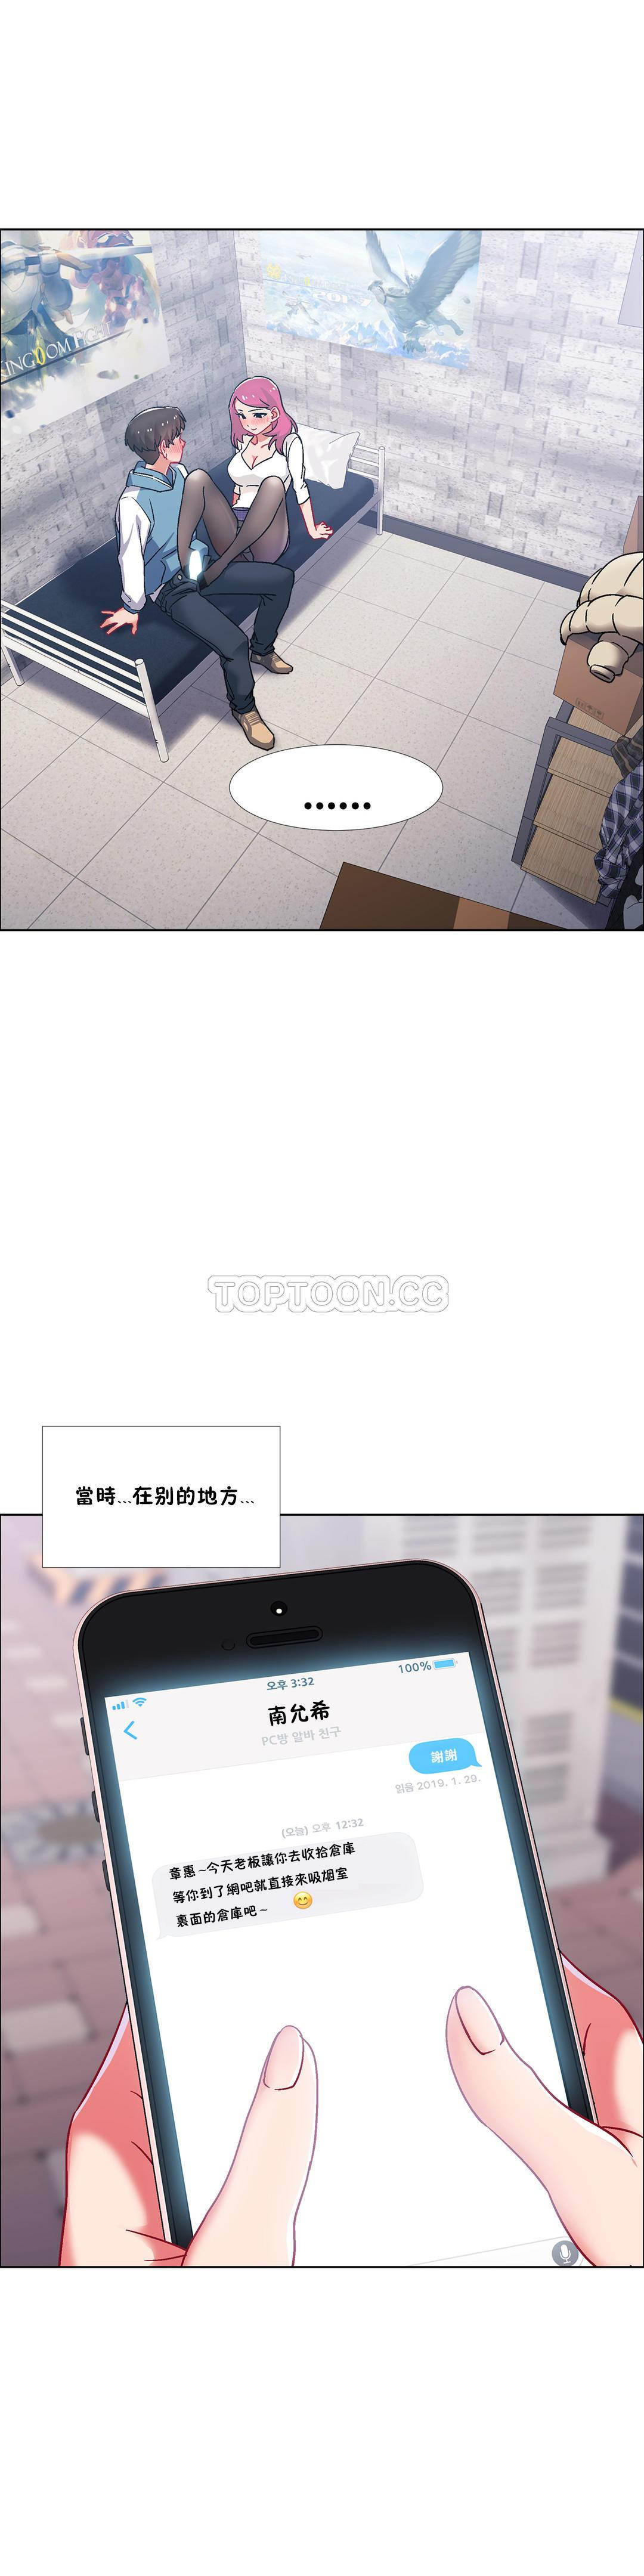 [Studio Wannabe] Rental Girls | 出租女郎 Ch. 33-58 [Chinese]  第二季 完结 171